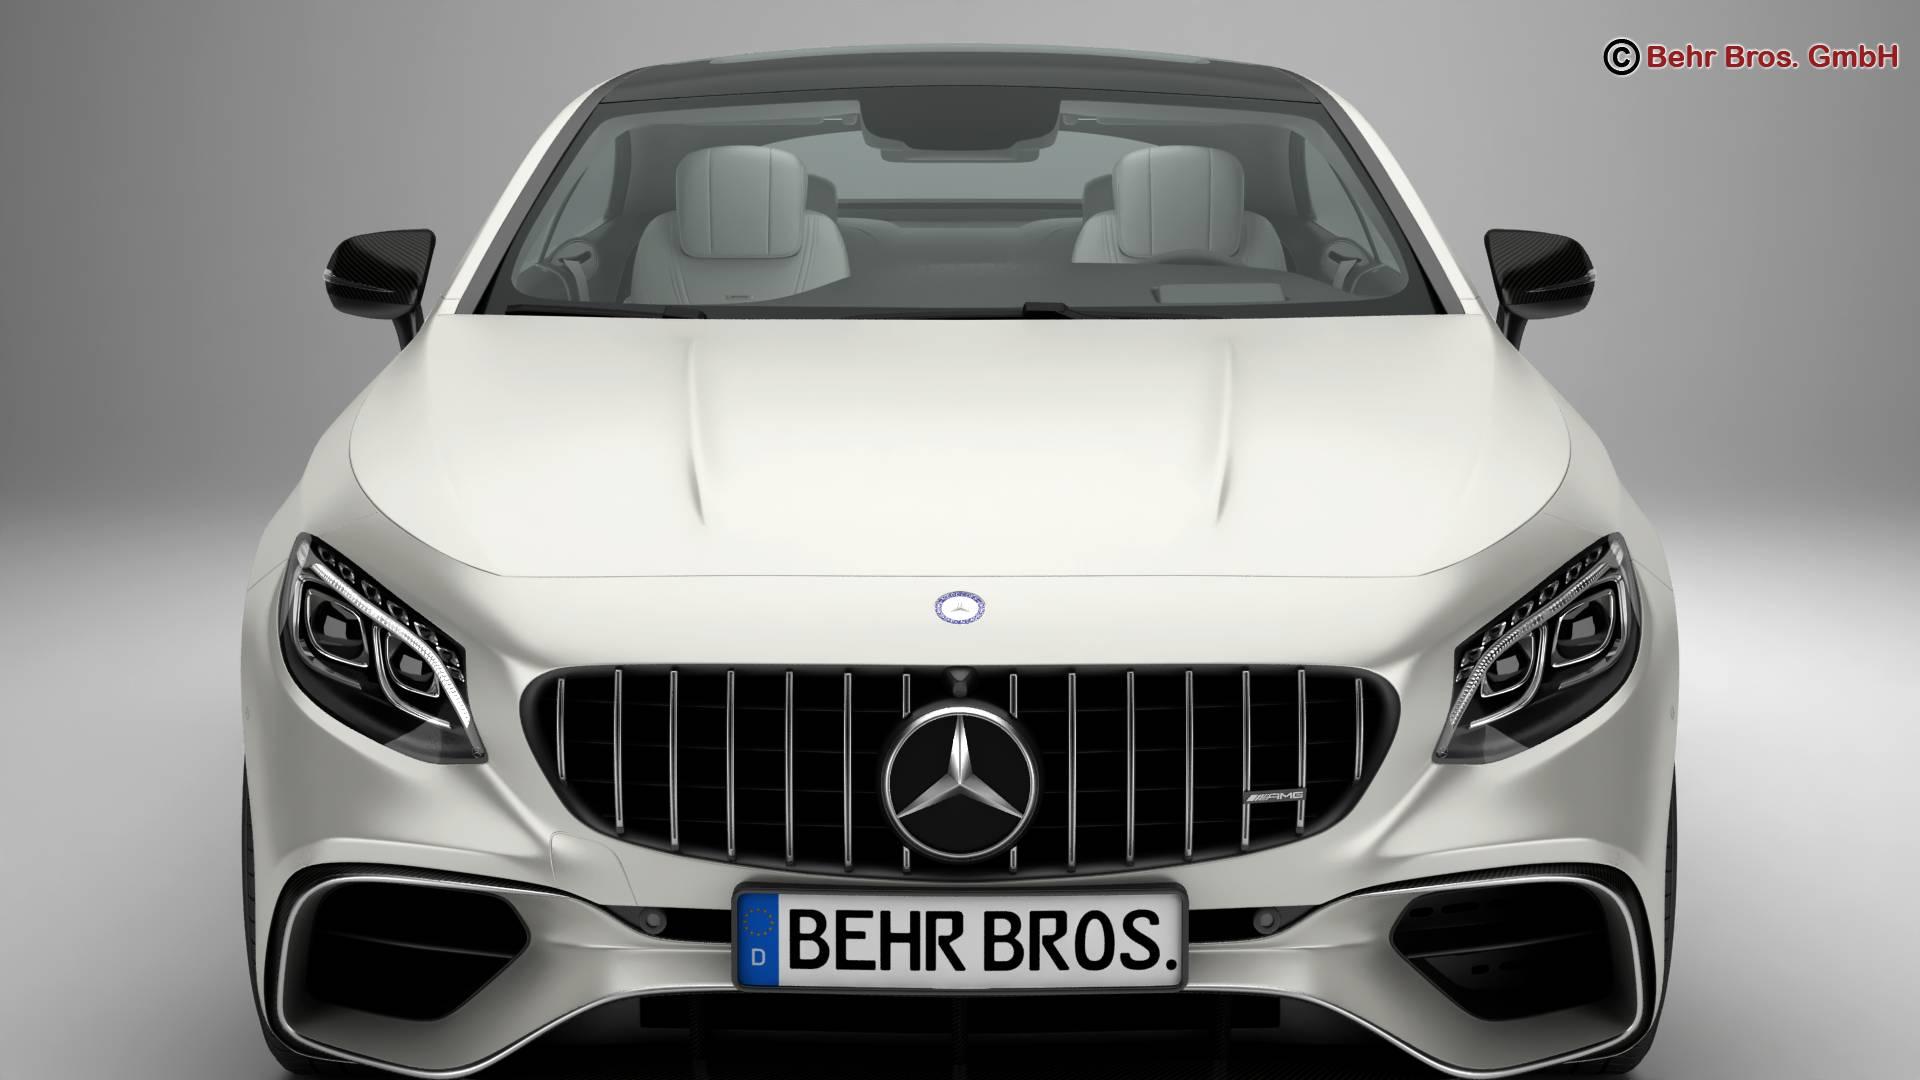 mercedes s klase kupeja s63 2018 3d modelis 3ds max fbx c4d lwo ma mb obj 274096